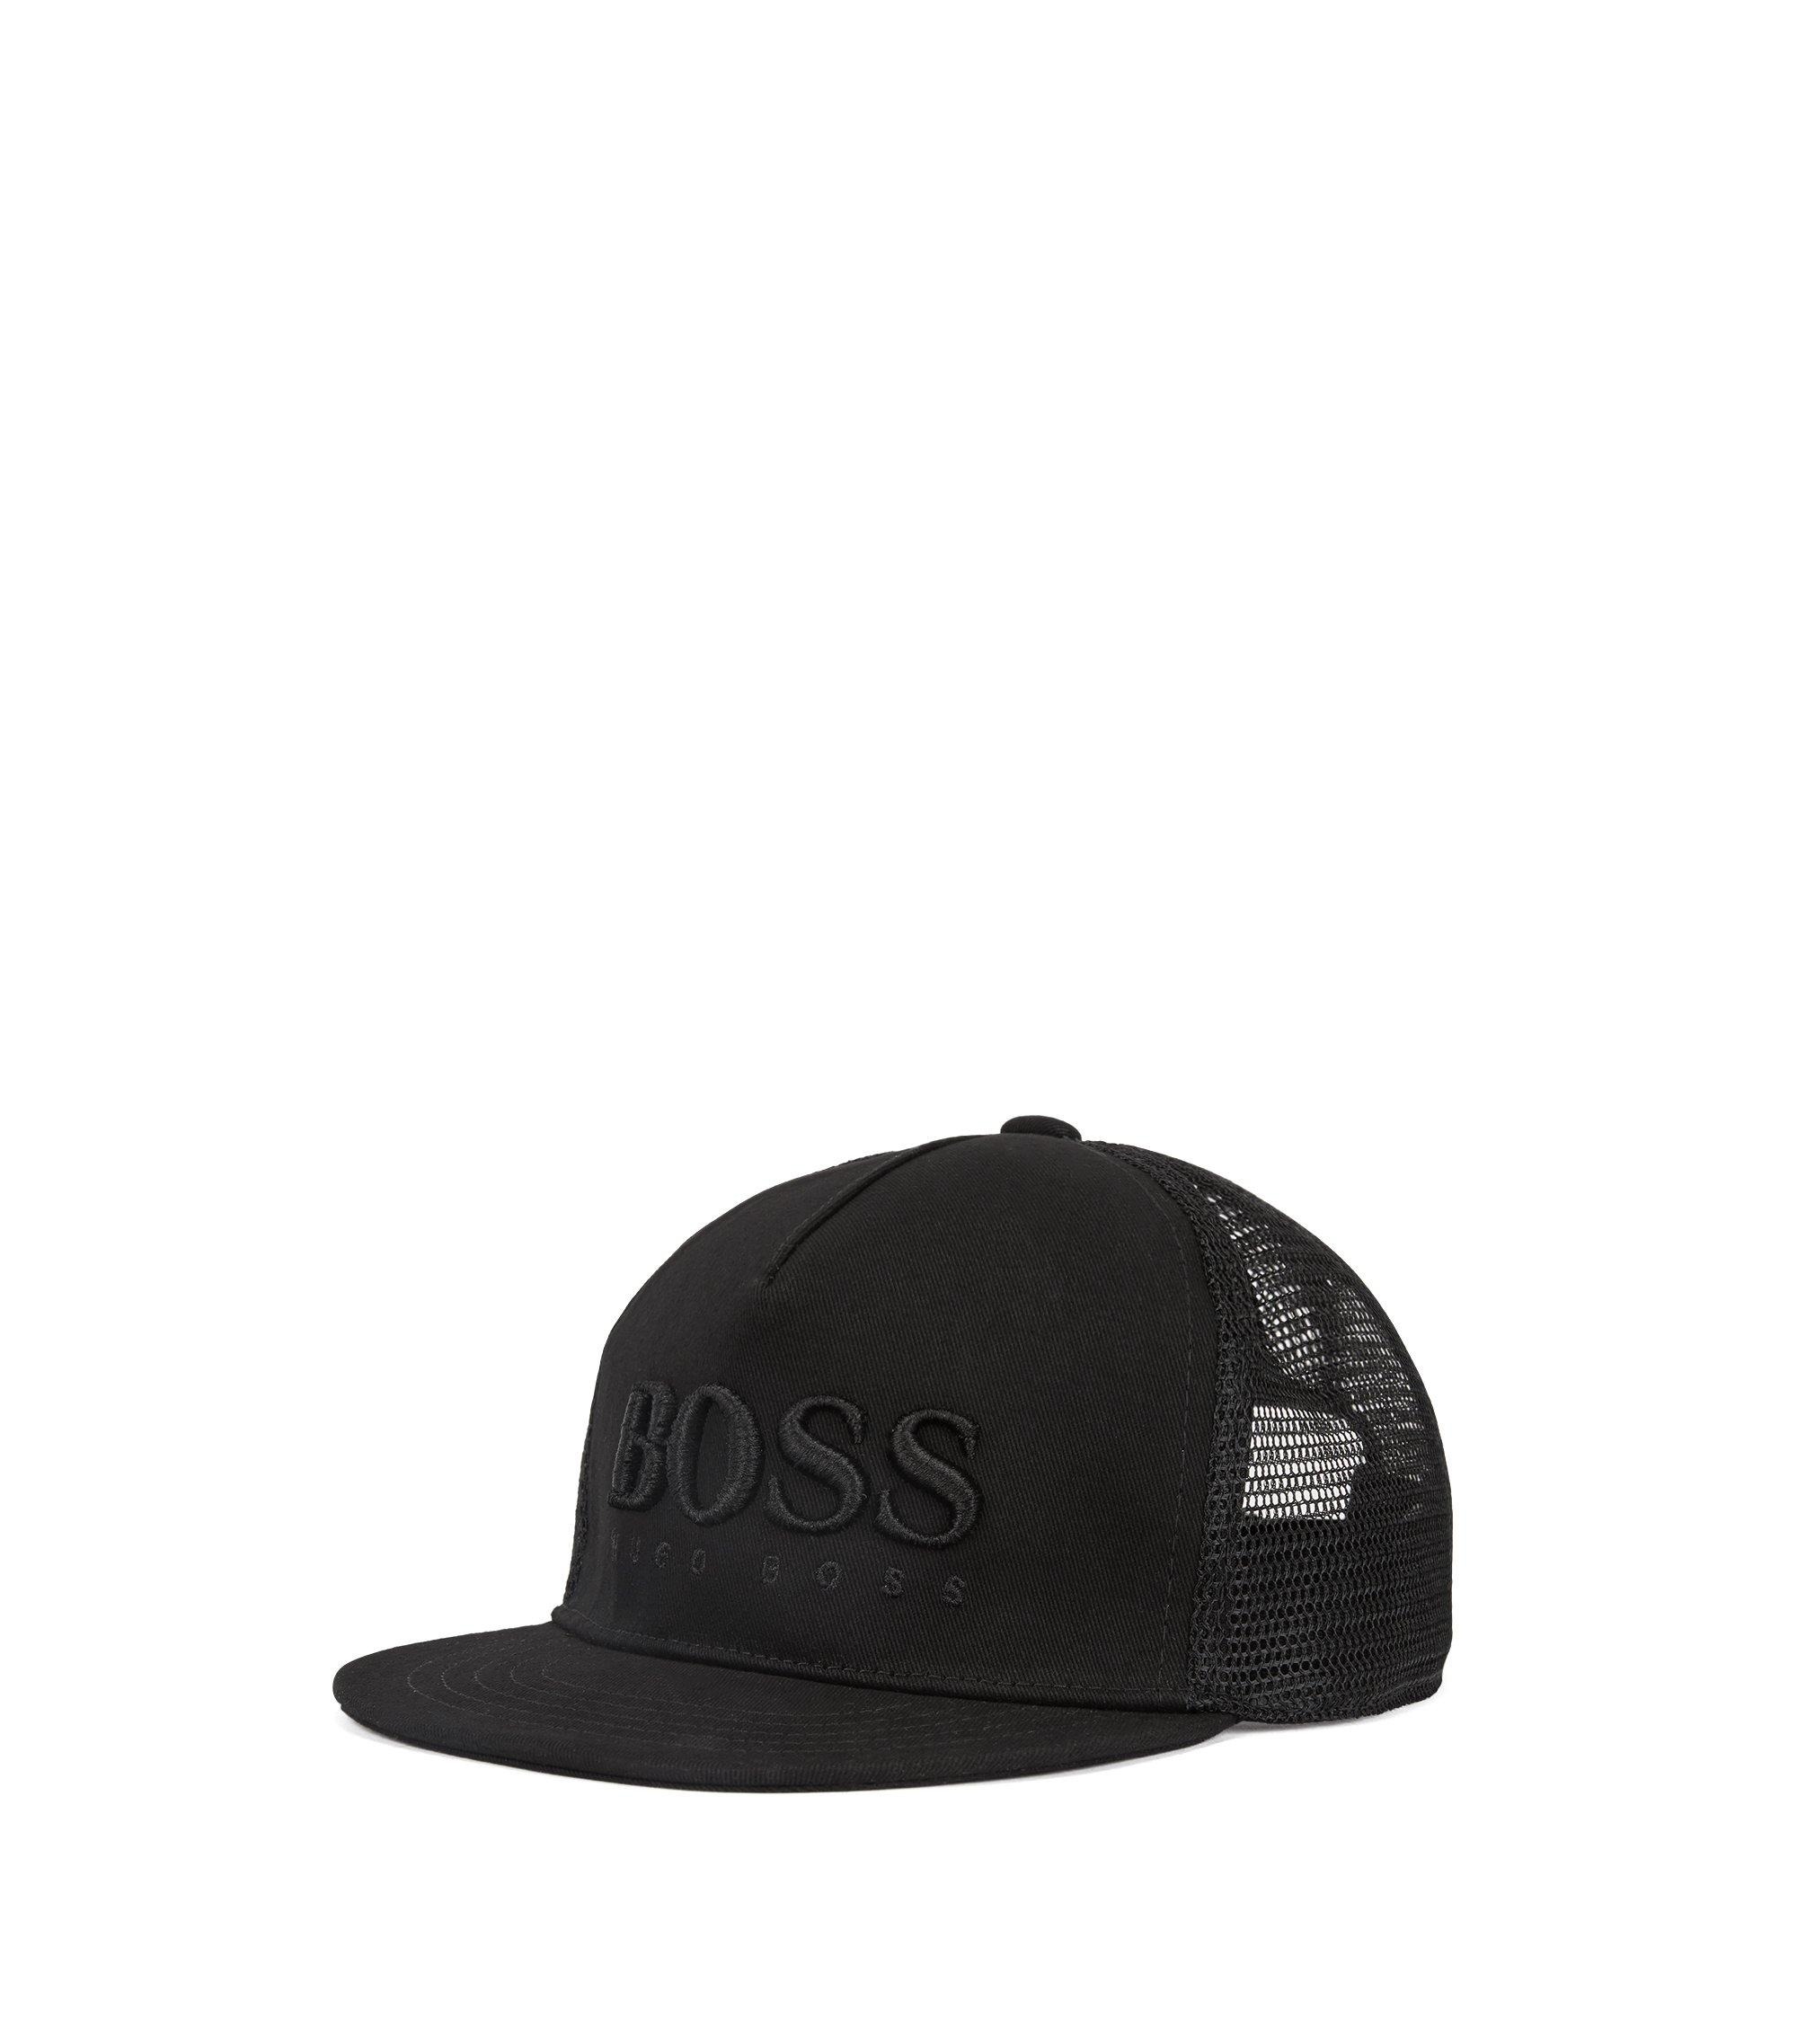 Kids' logo-embroidered baseball cap with mesh panel, Black